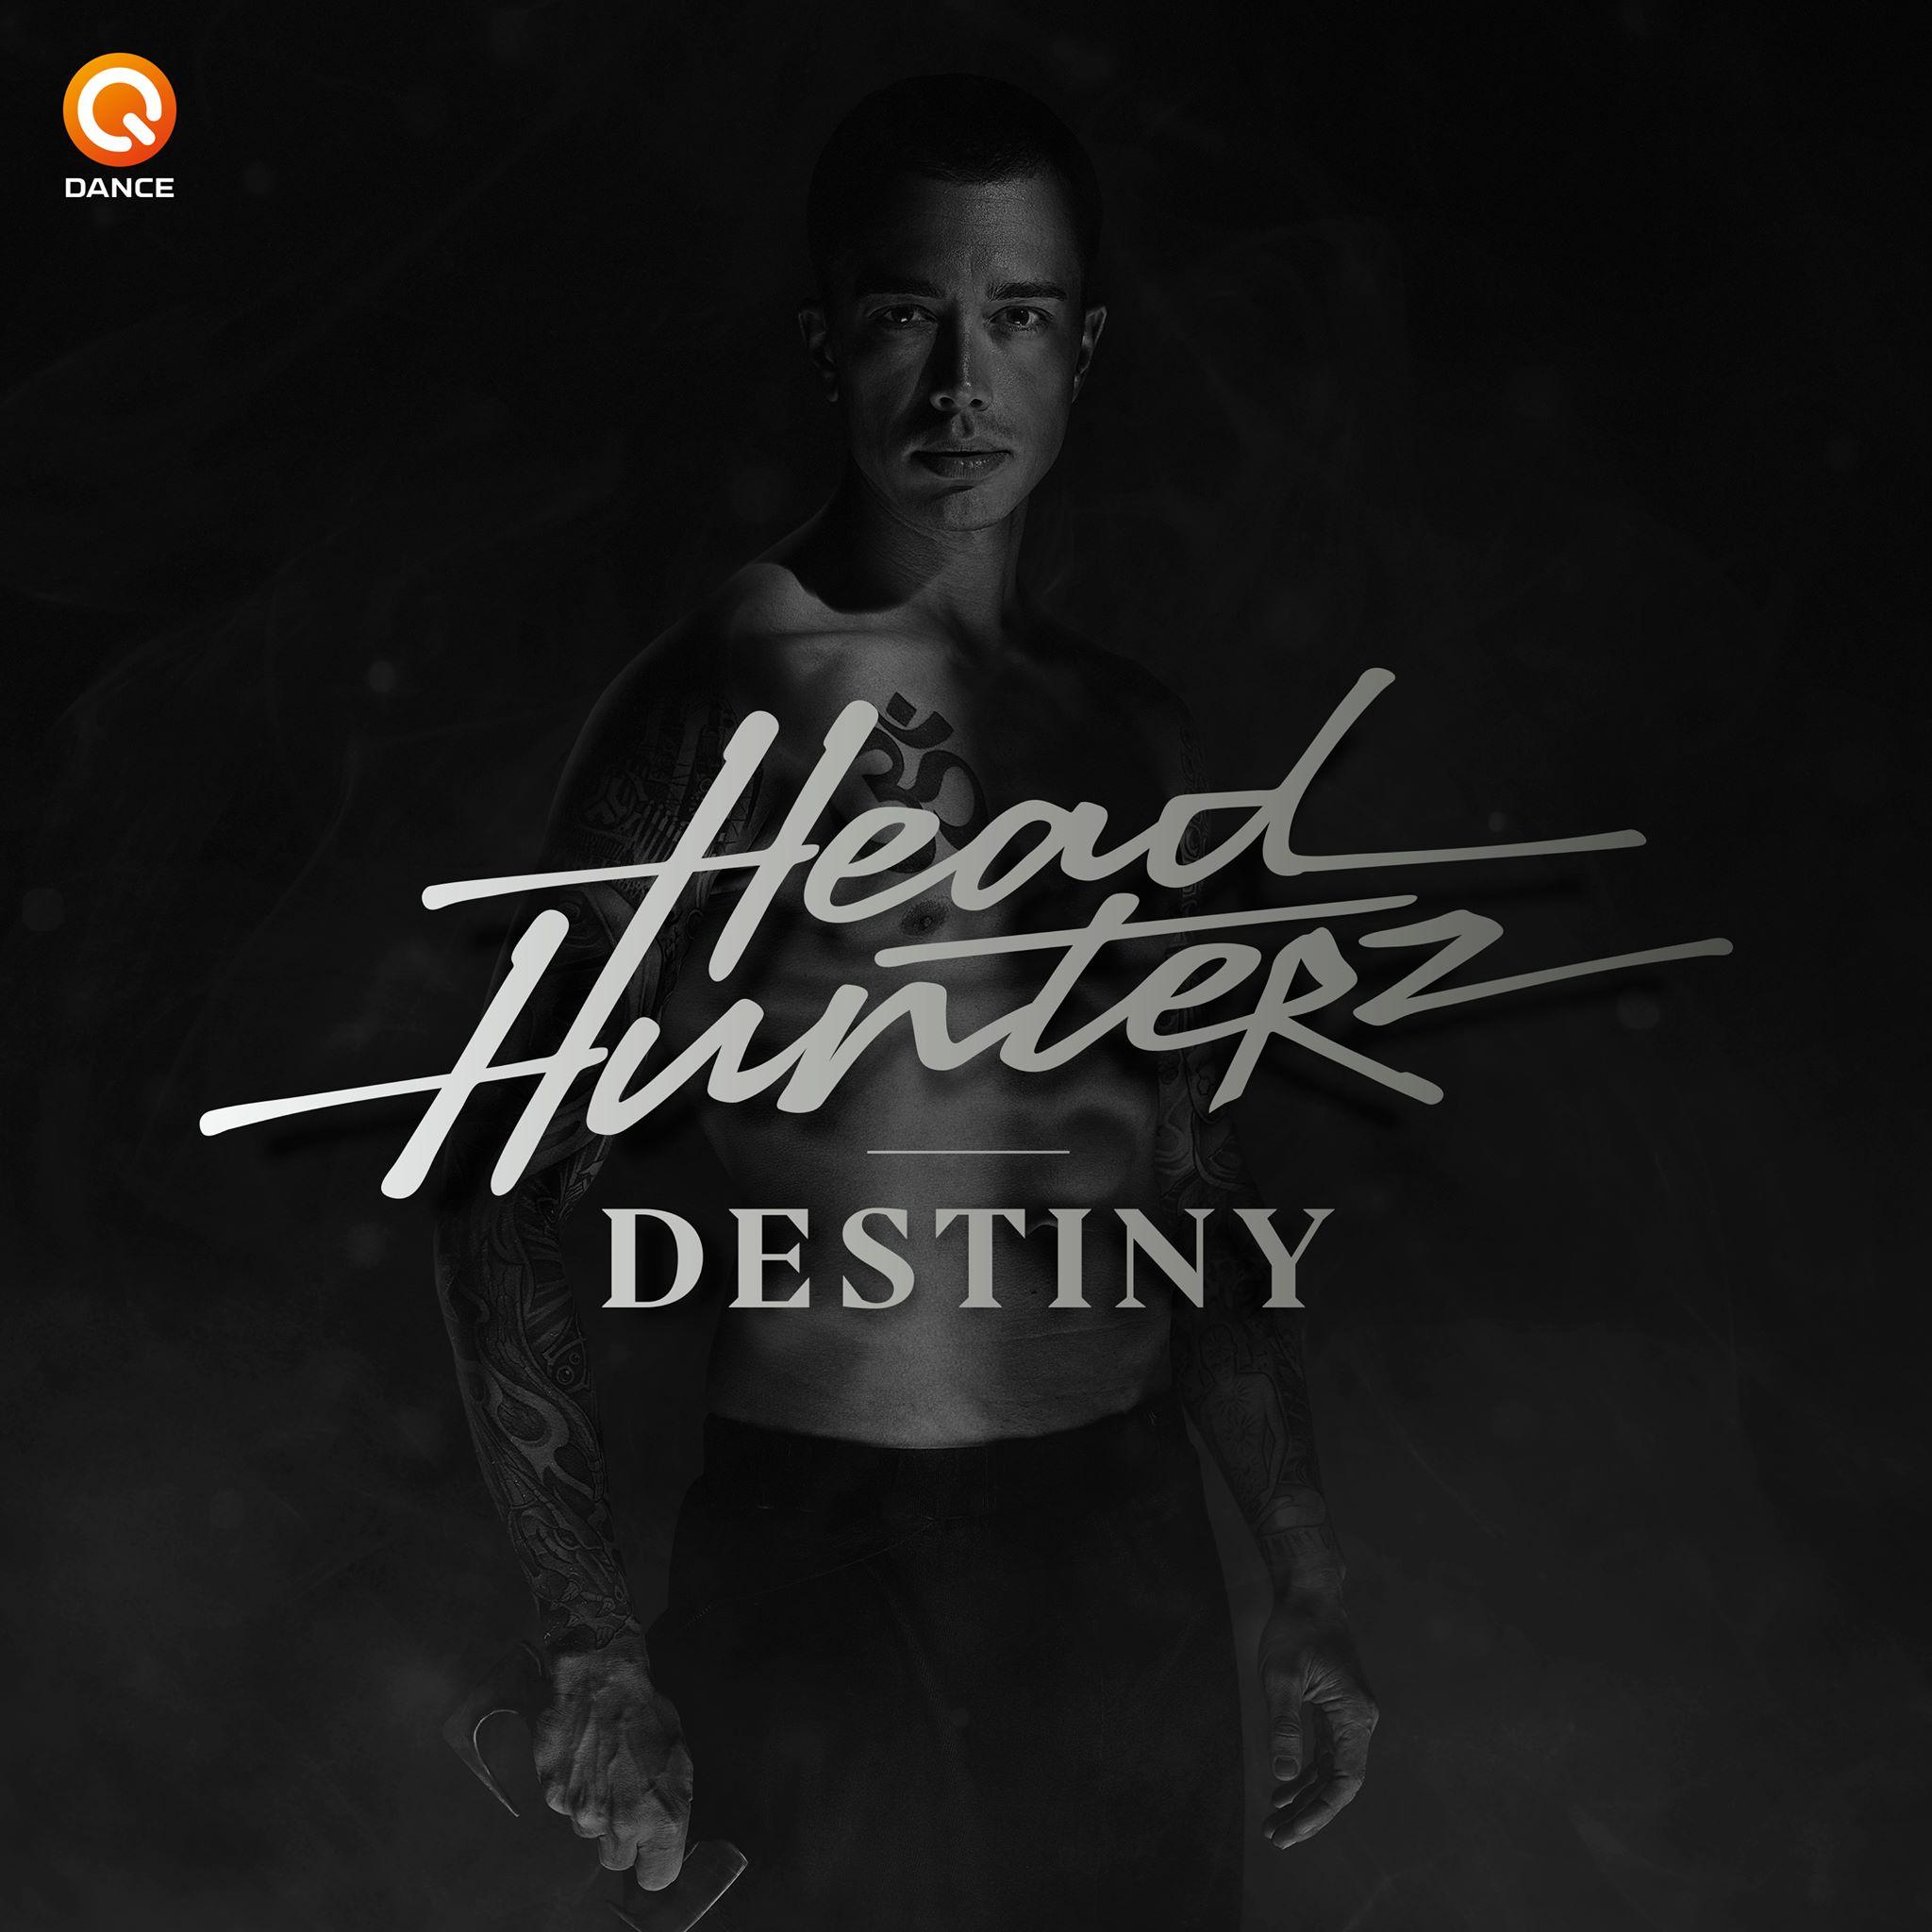 Headhunterz - Destiny [Q-DANCE RECORDS] Q161